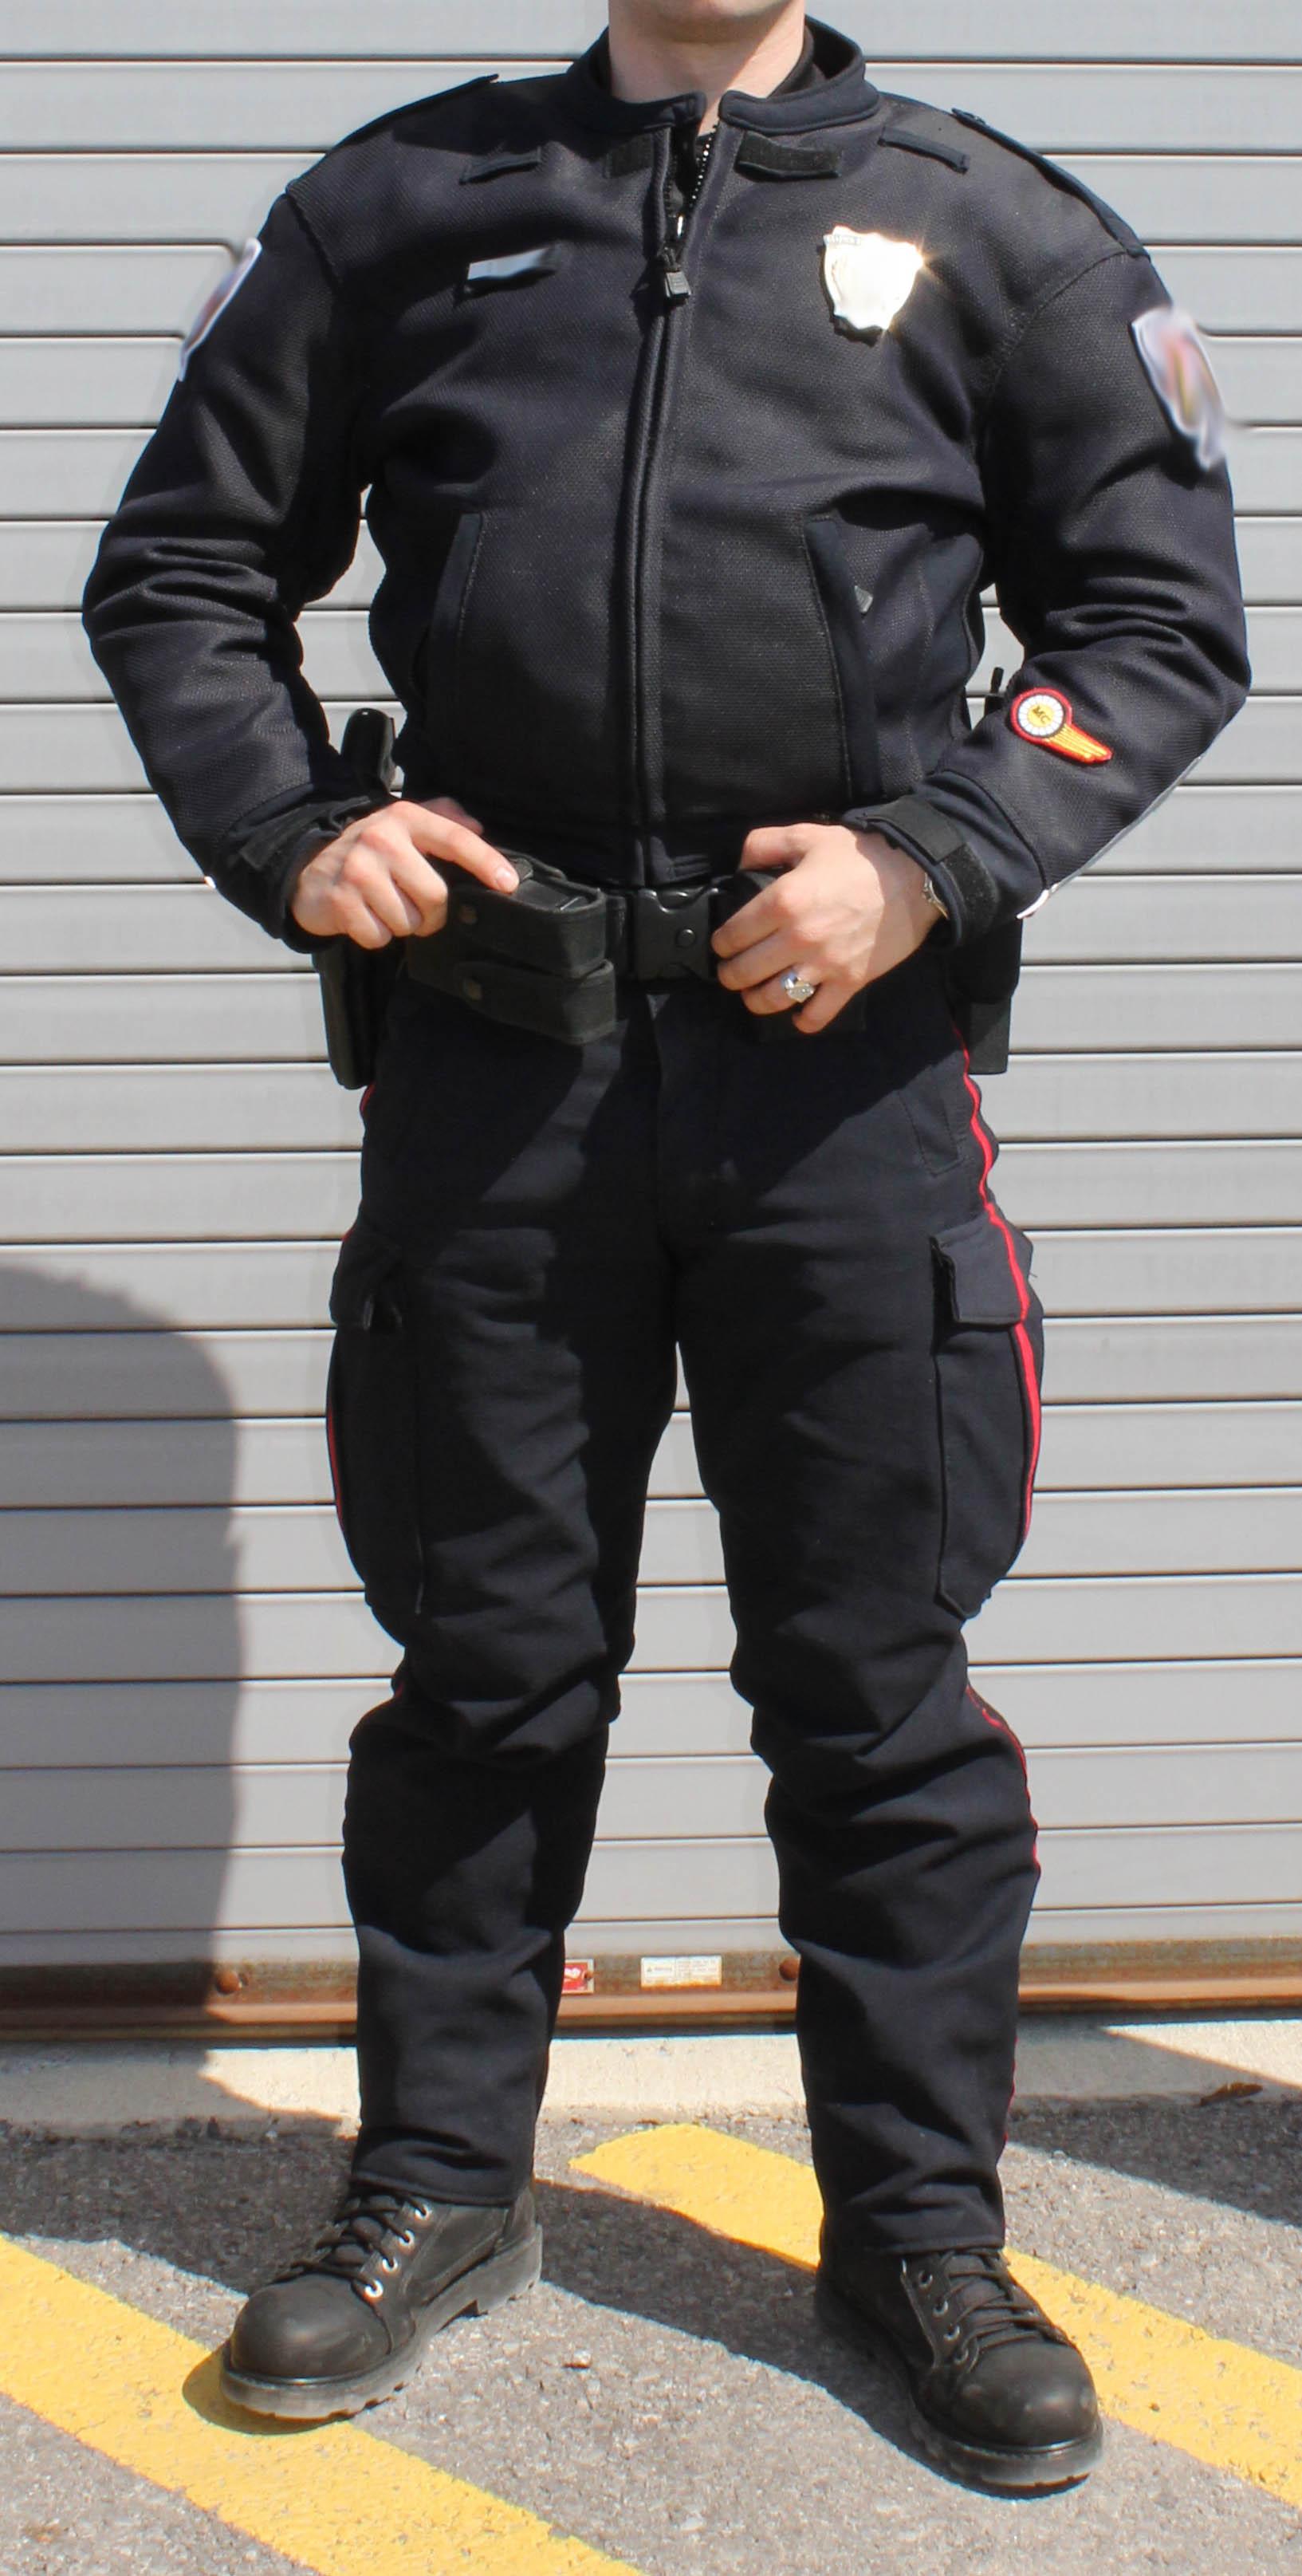 Police Air Mesh Jacket Motoport Usa